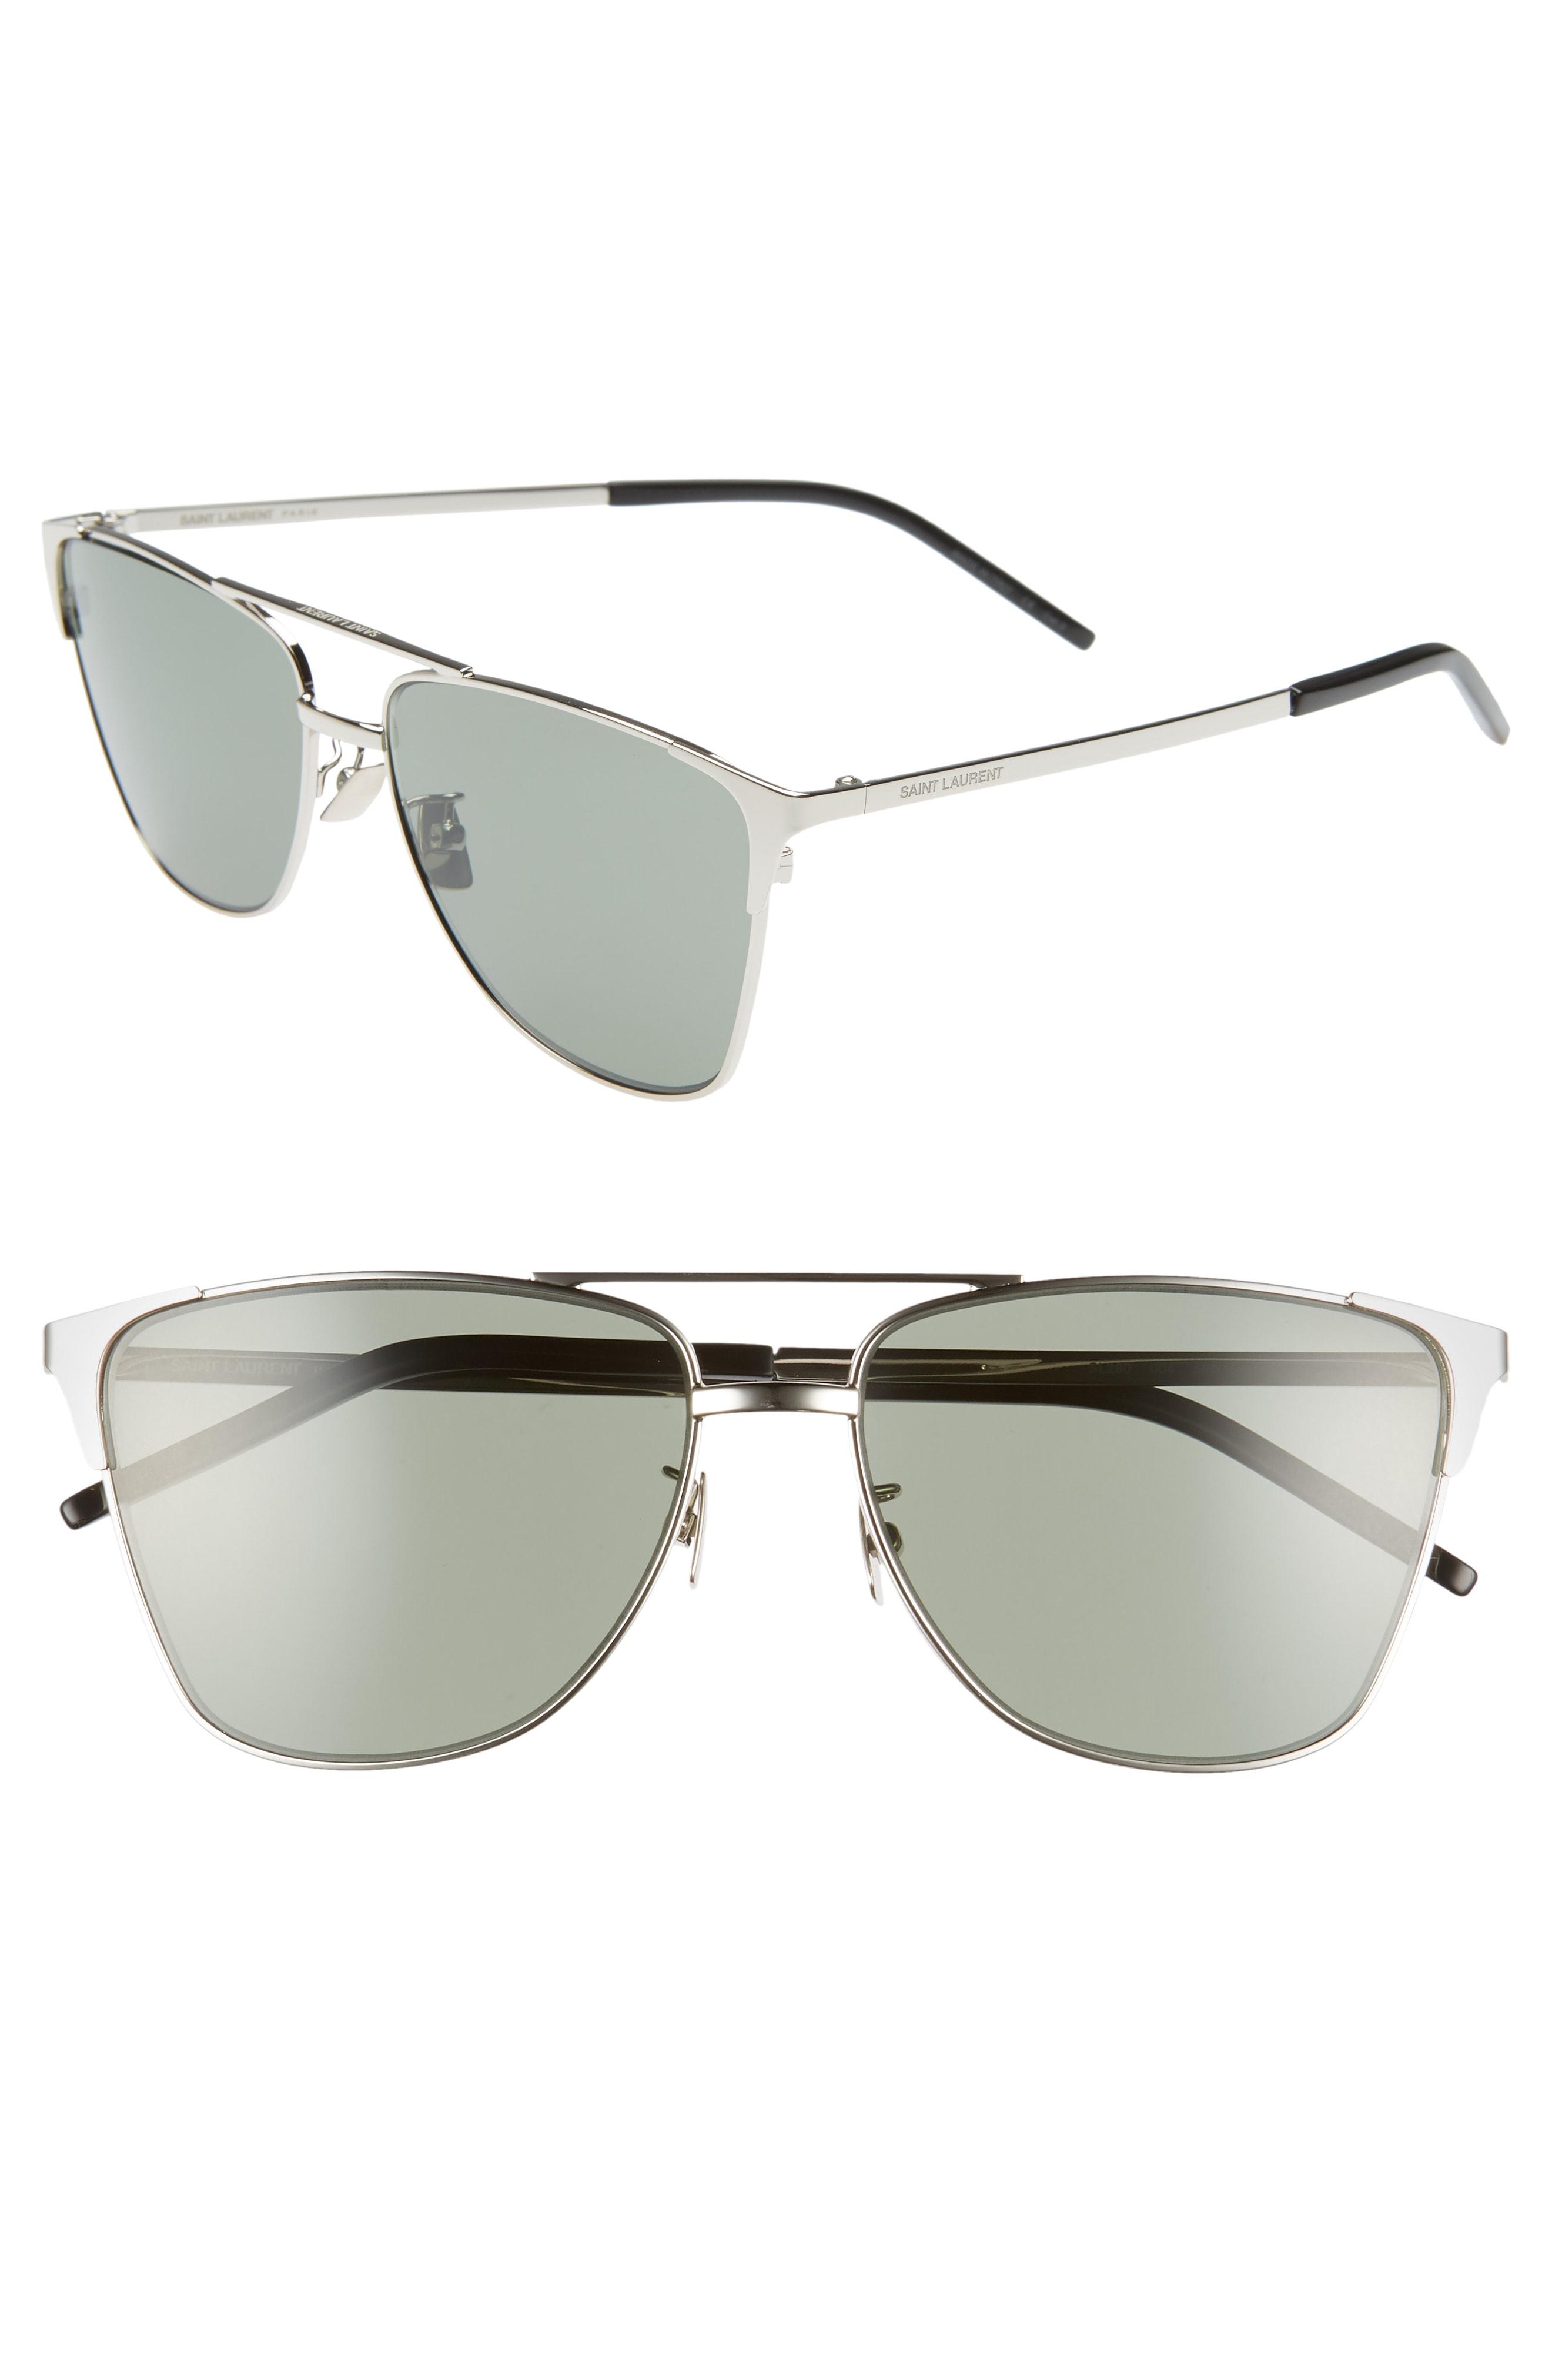 bb127eb58 Men's Saint Laurent 59Mm Aviator Sunglasses – Silver | The Fashionisto